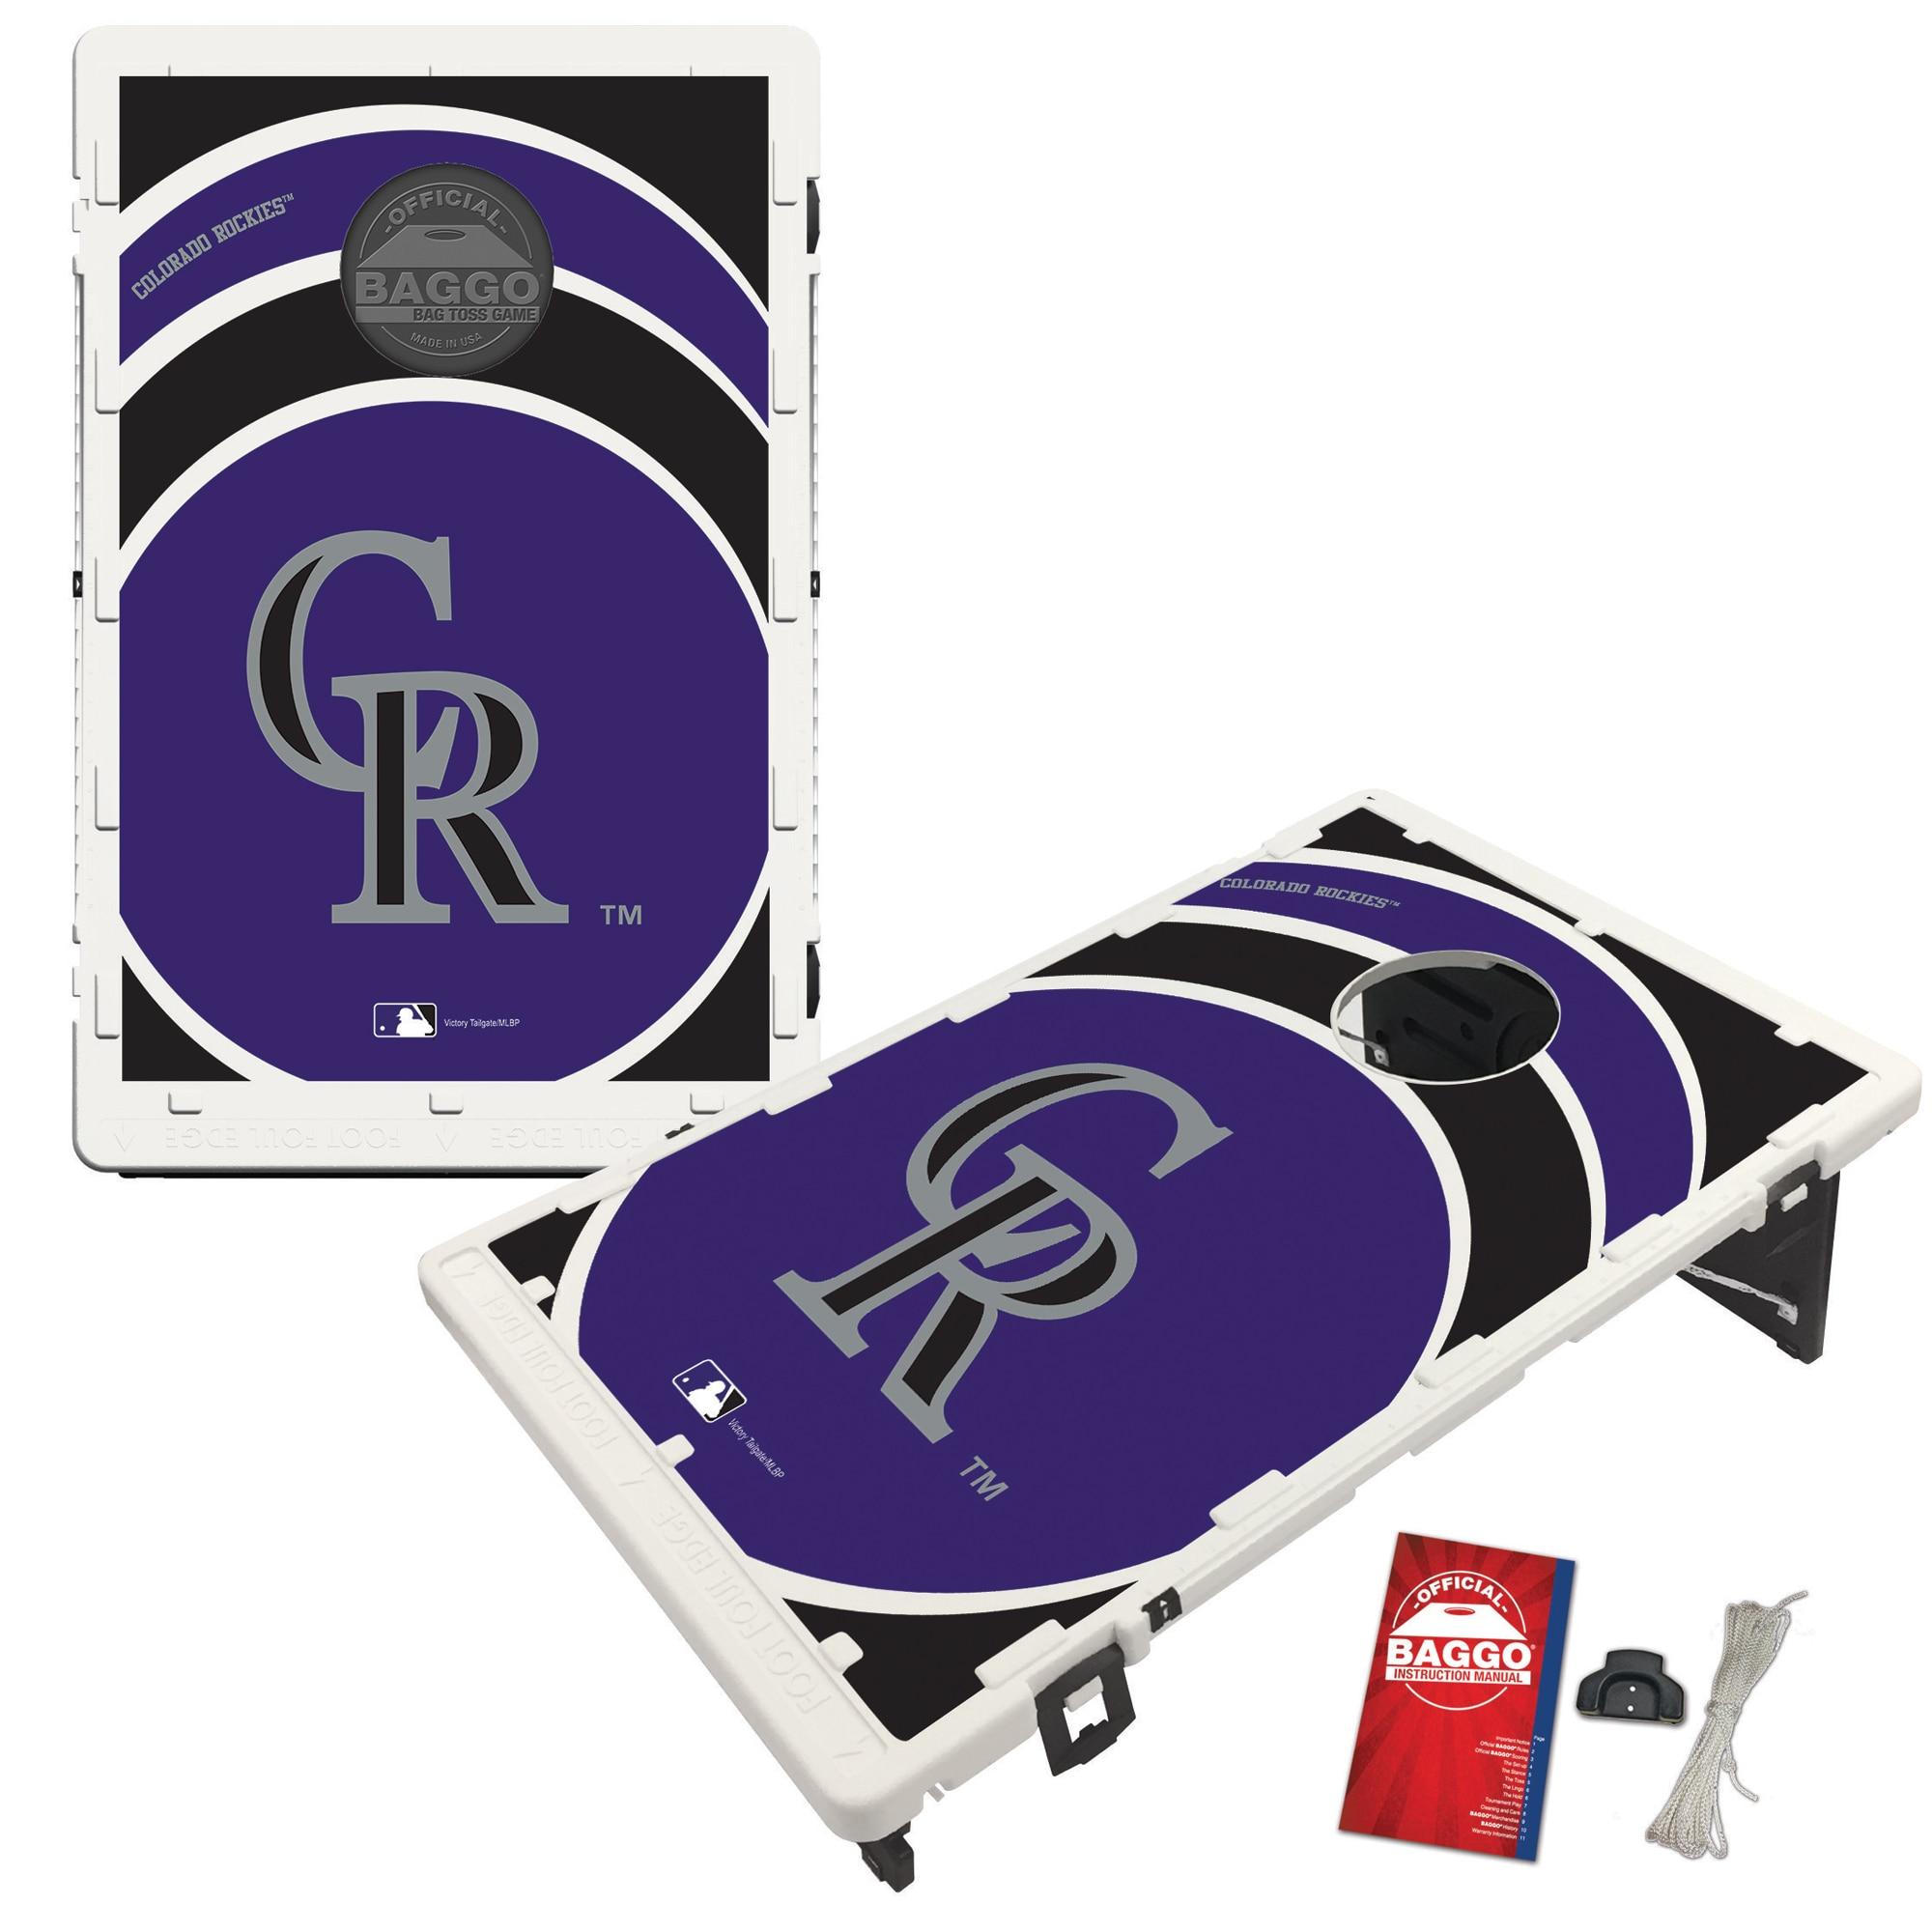 Colorado Rockies 2' x 3' BAGGO Vortex Cornhole Board Tailgate Toss Set